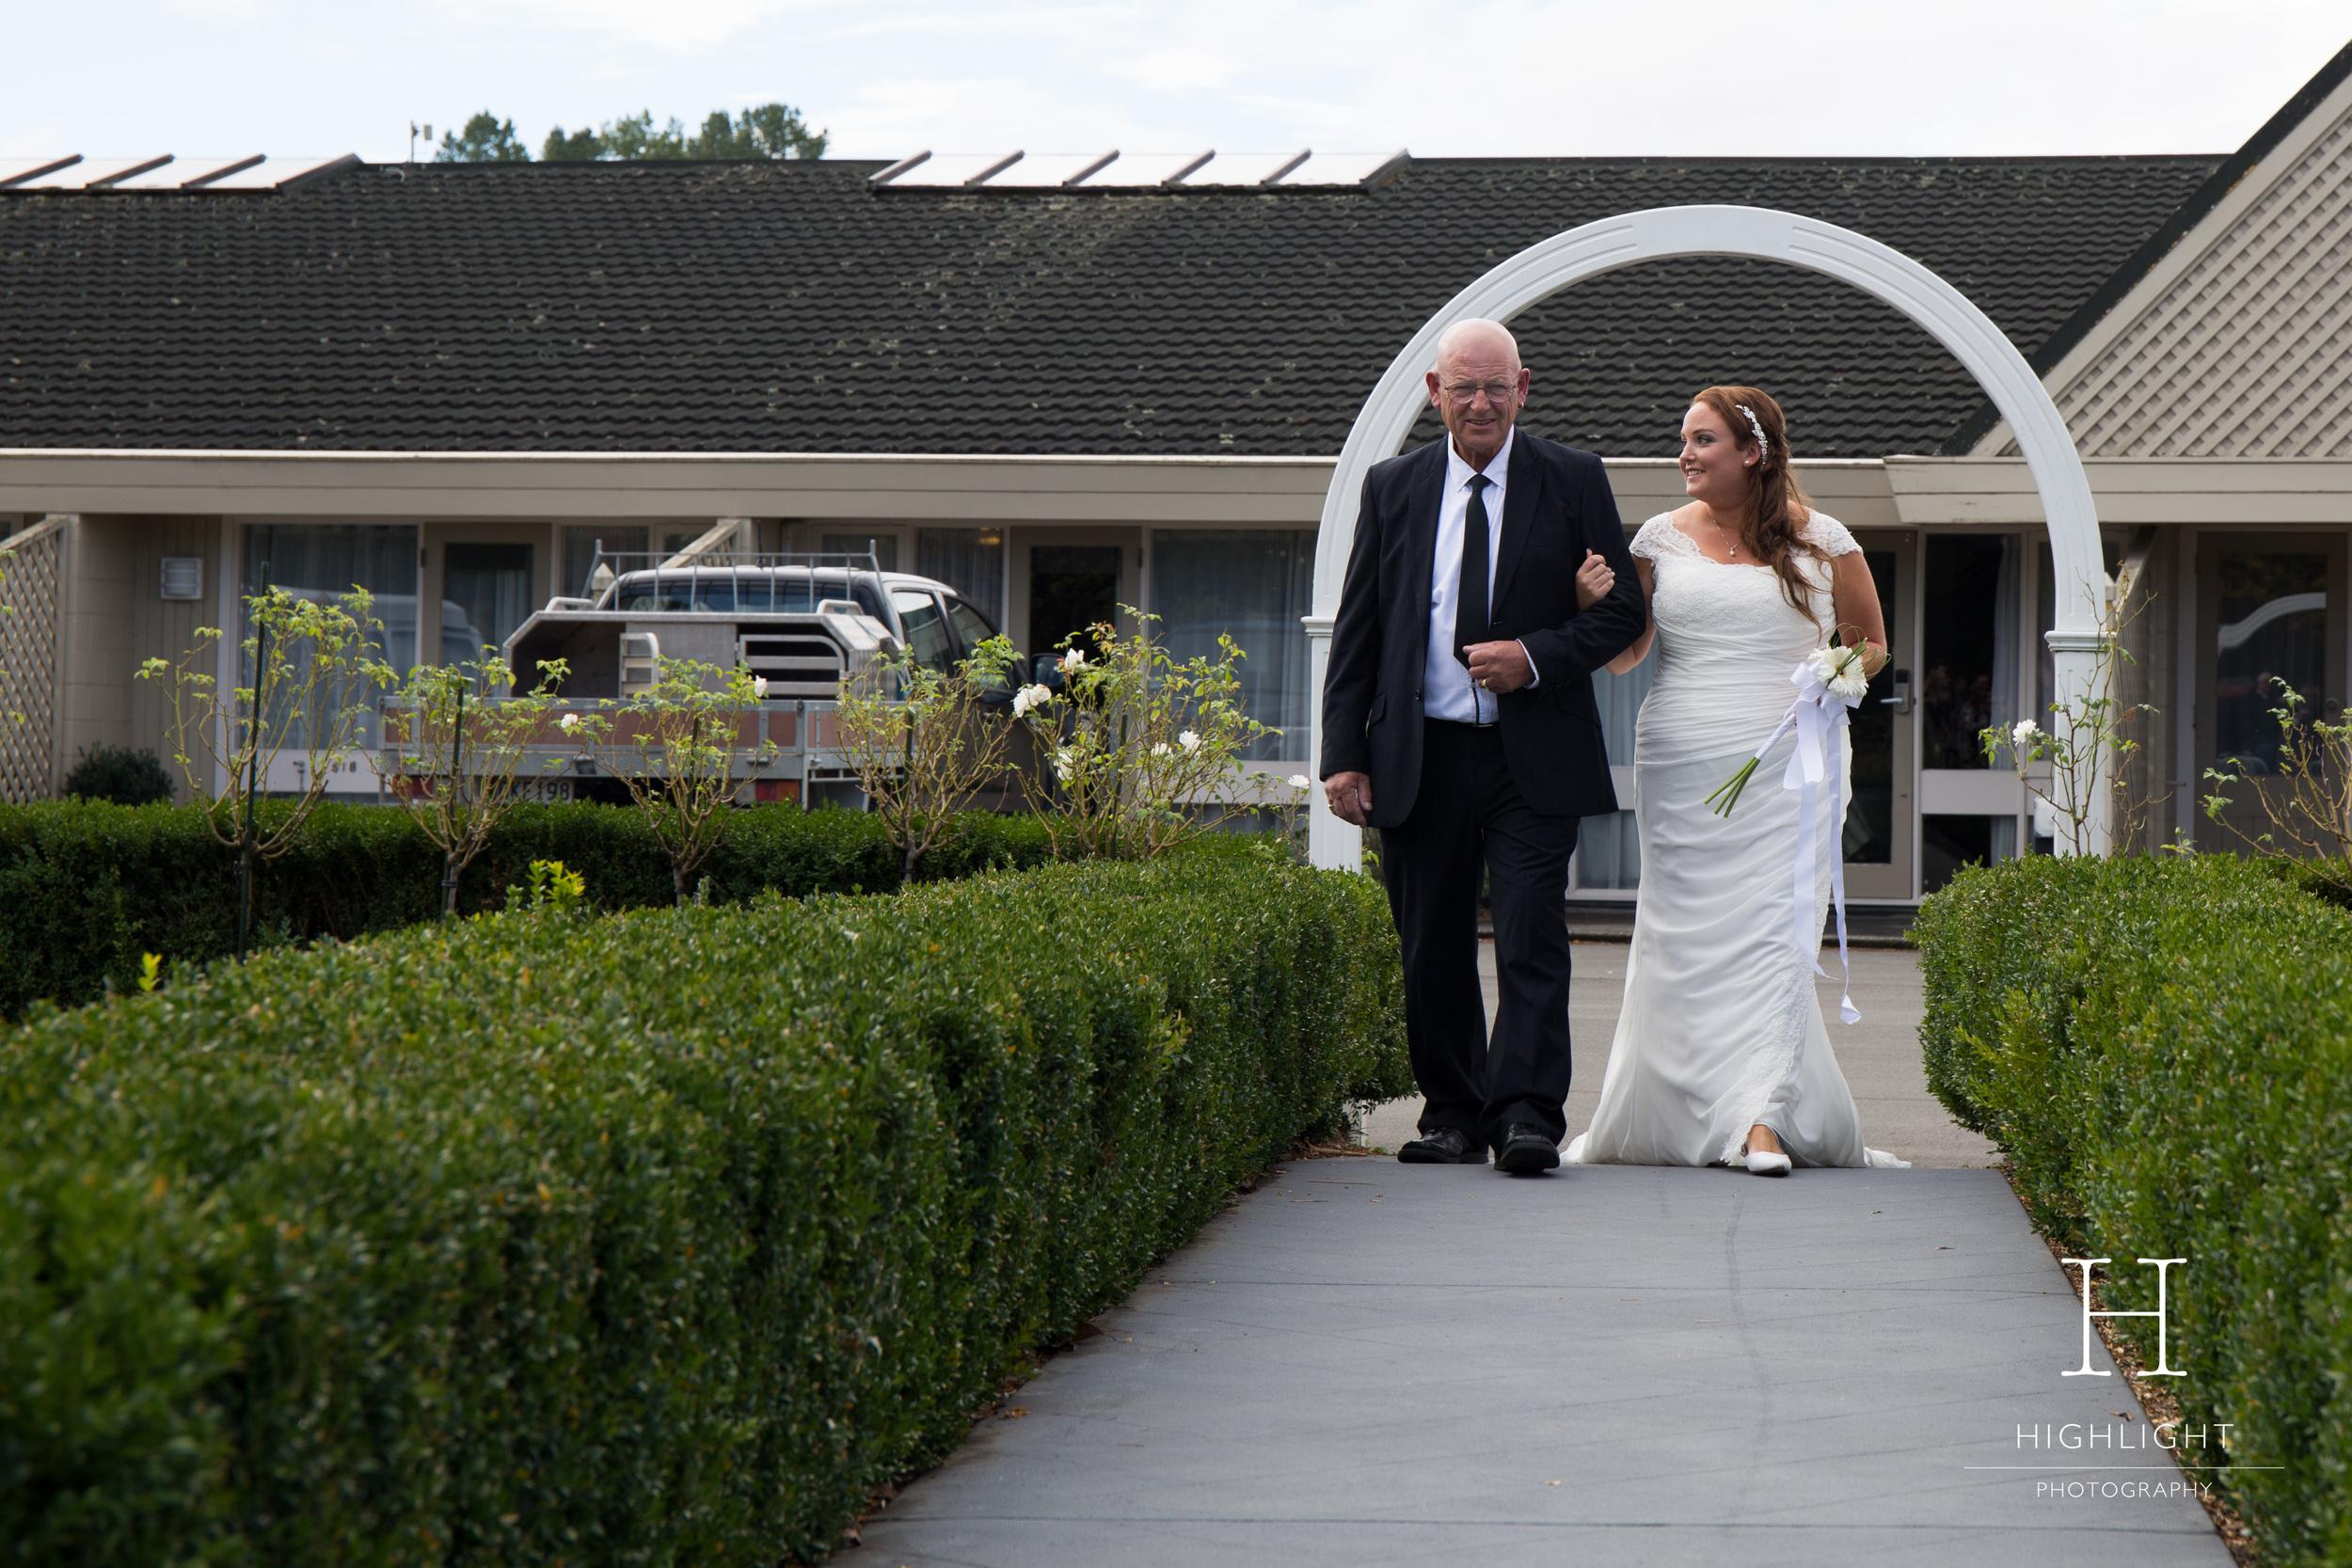 highlight-photography_copthorne-masterton-wedding.jpg